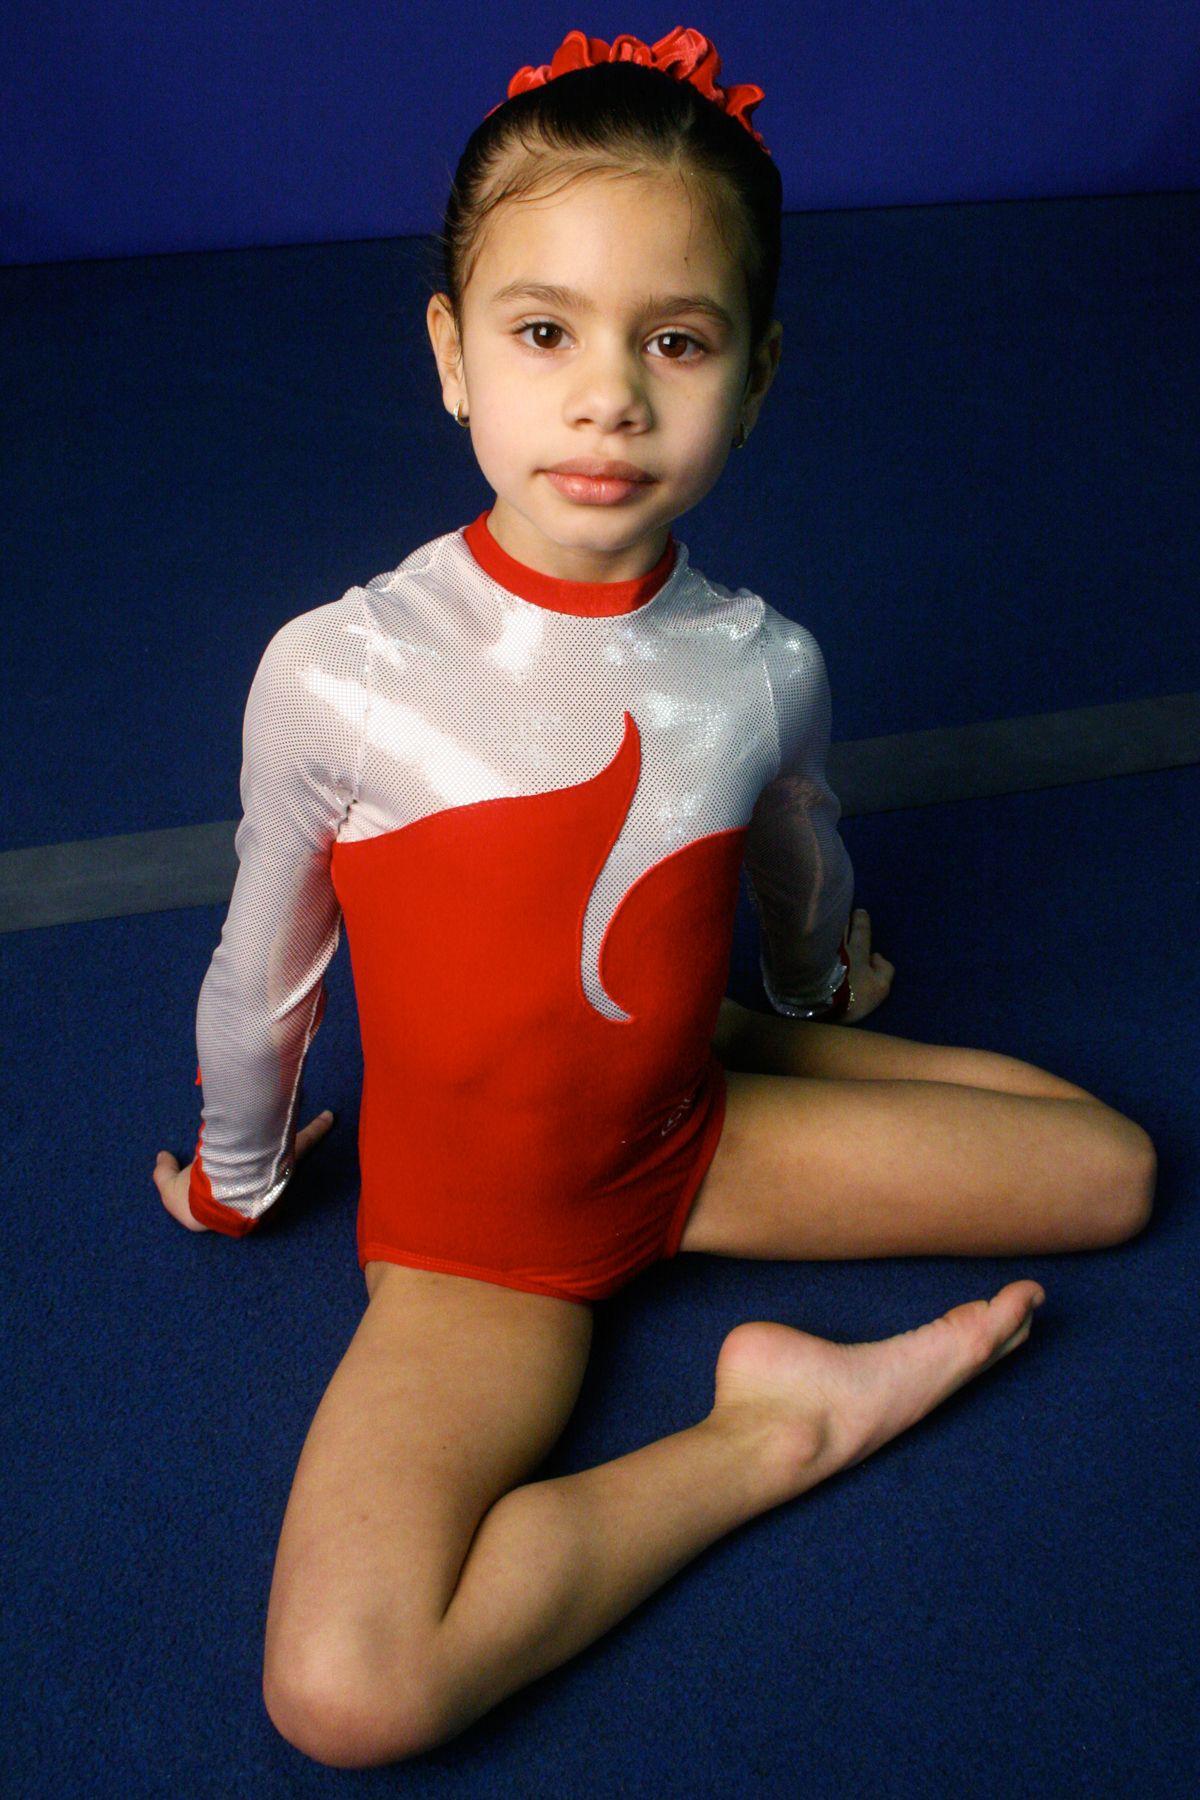 gym pose | gym | Gymnastics girls, Gymnastics, Christmas sweaters